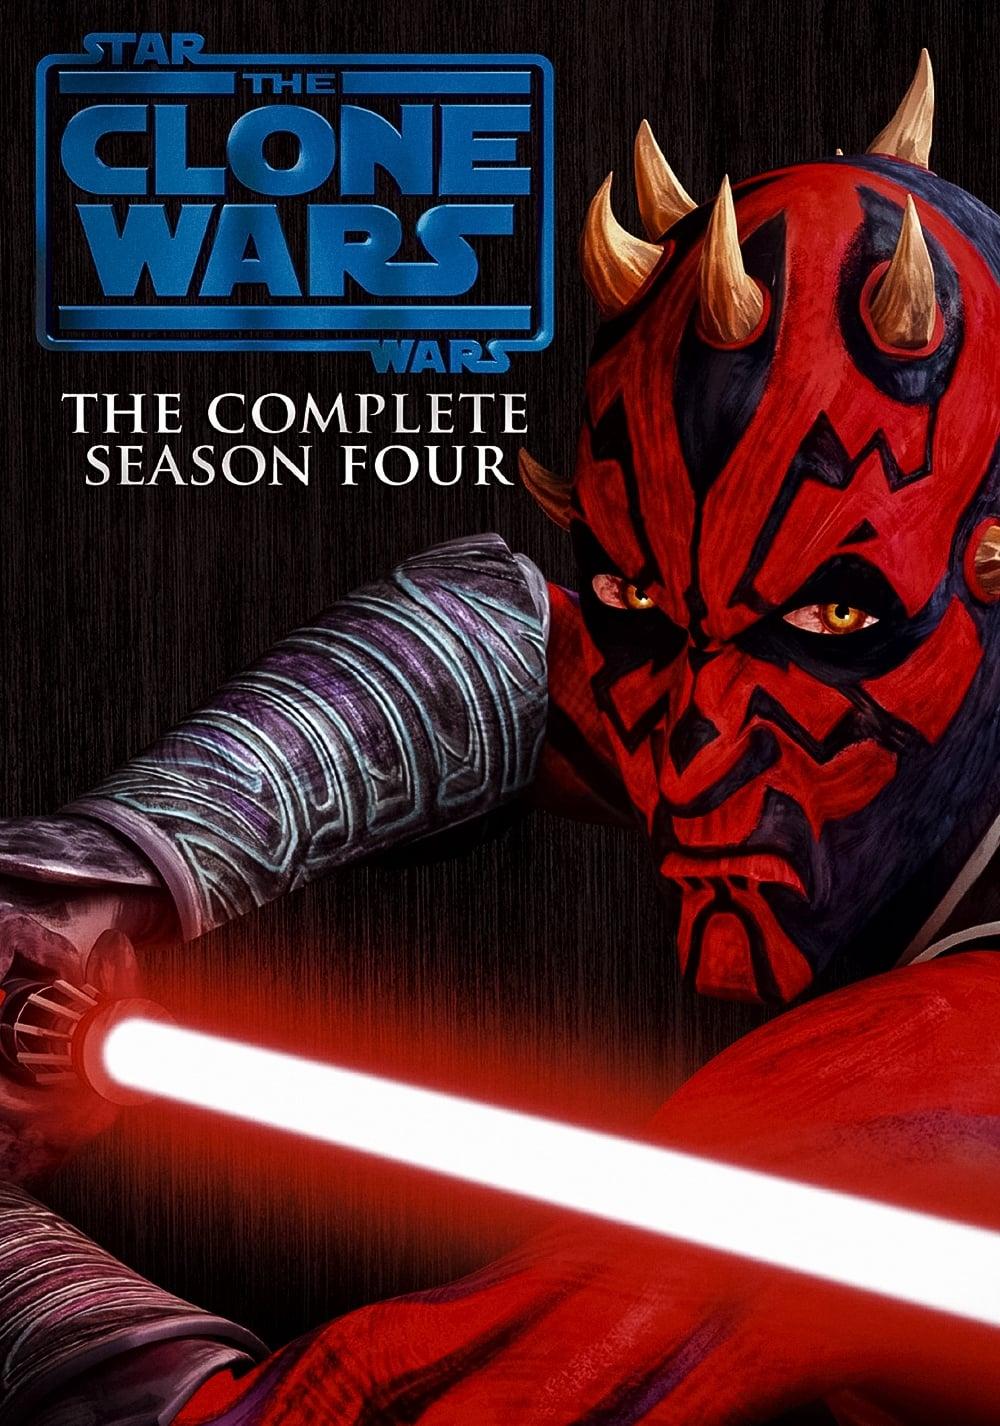 Star Wars: The Clone Wars Season 4